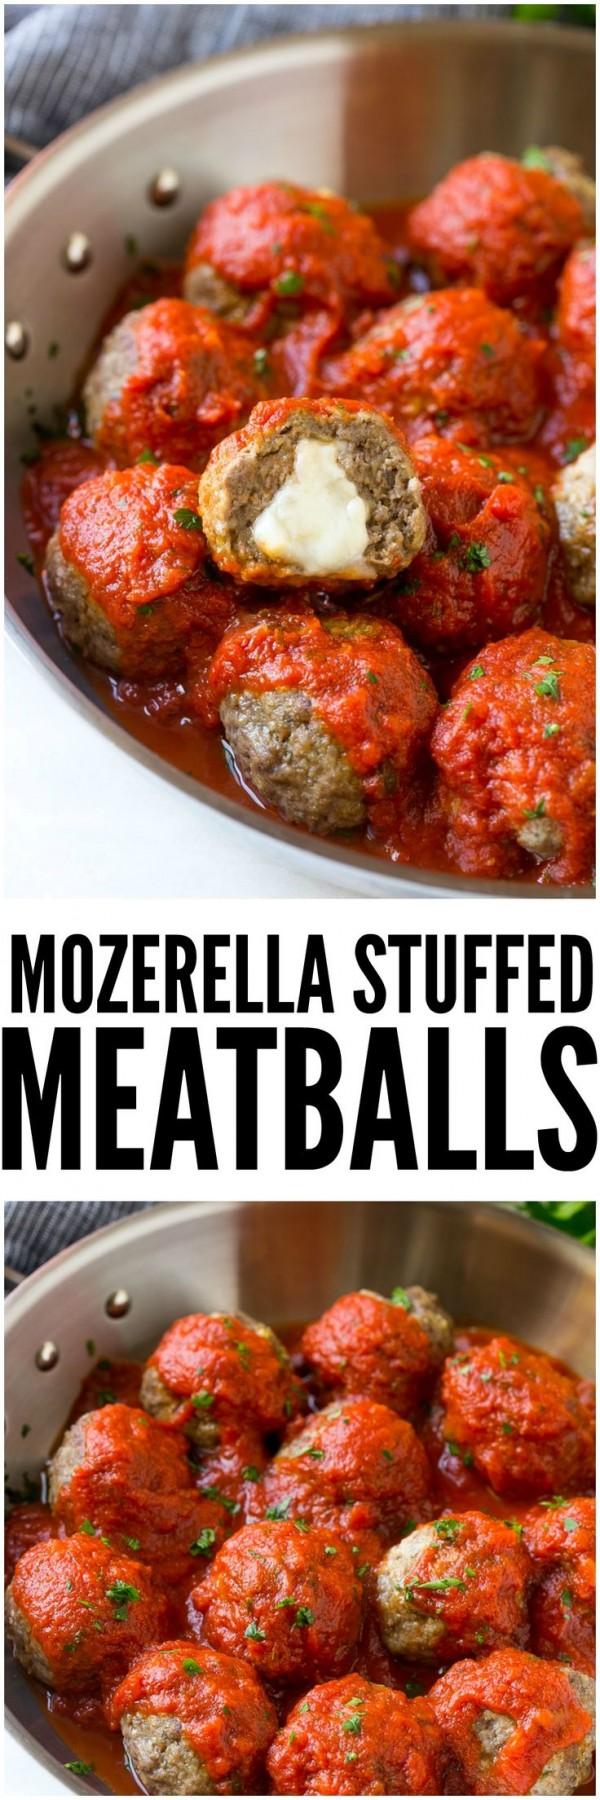 Get the recipe Mozzarella Stuffed Meatballs @recipes_to_go